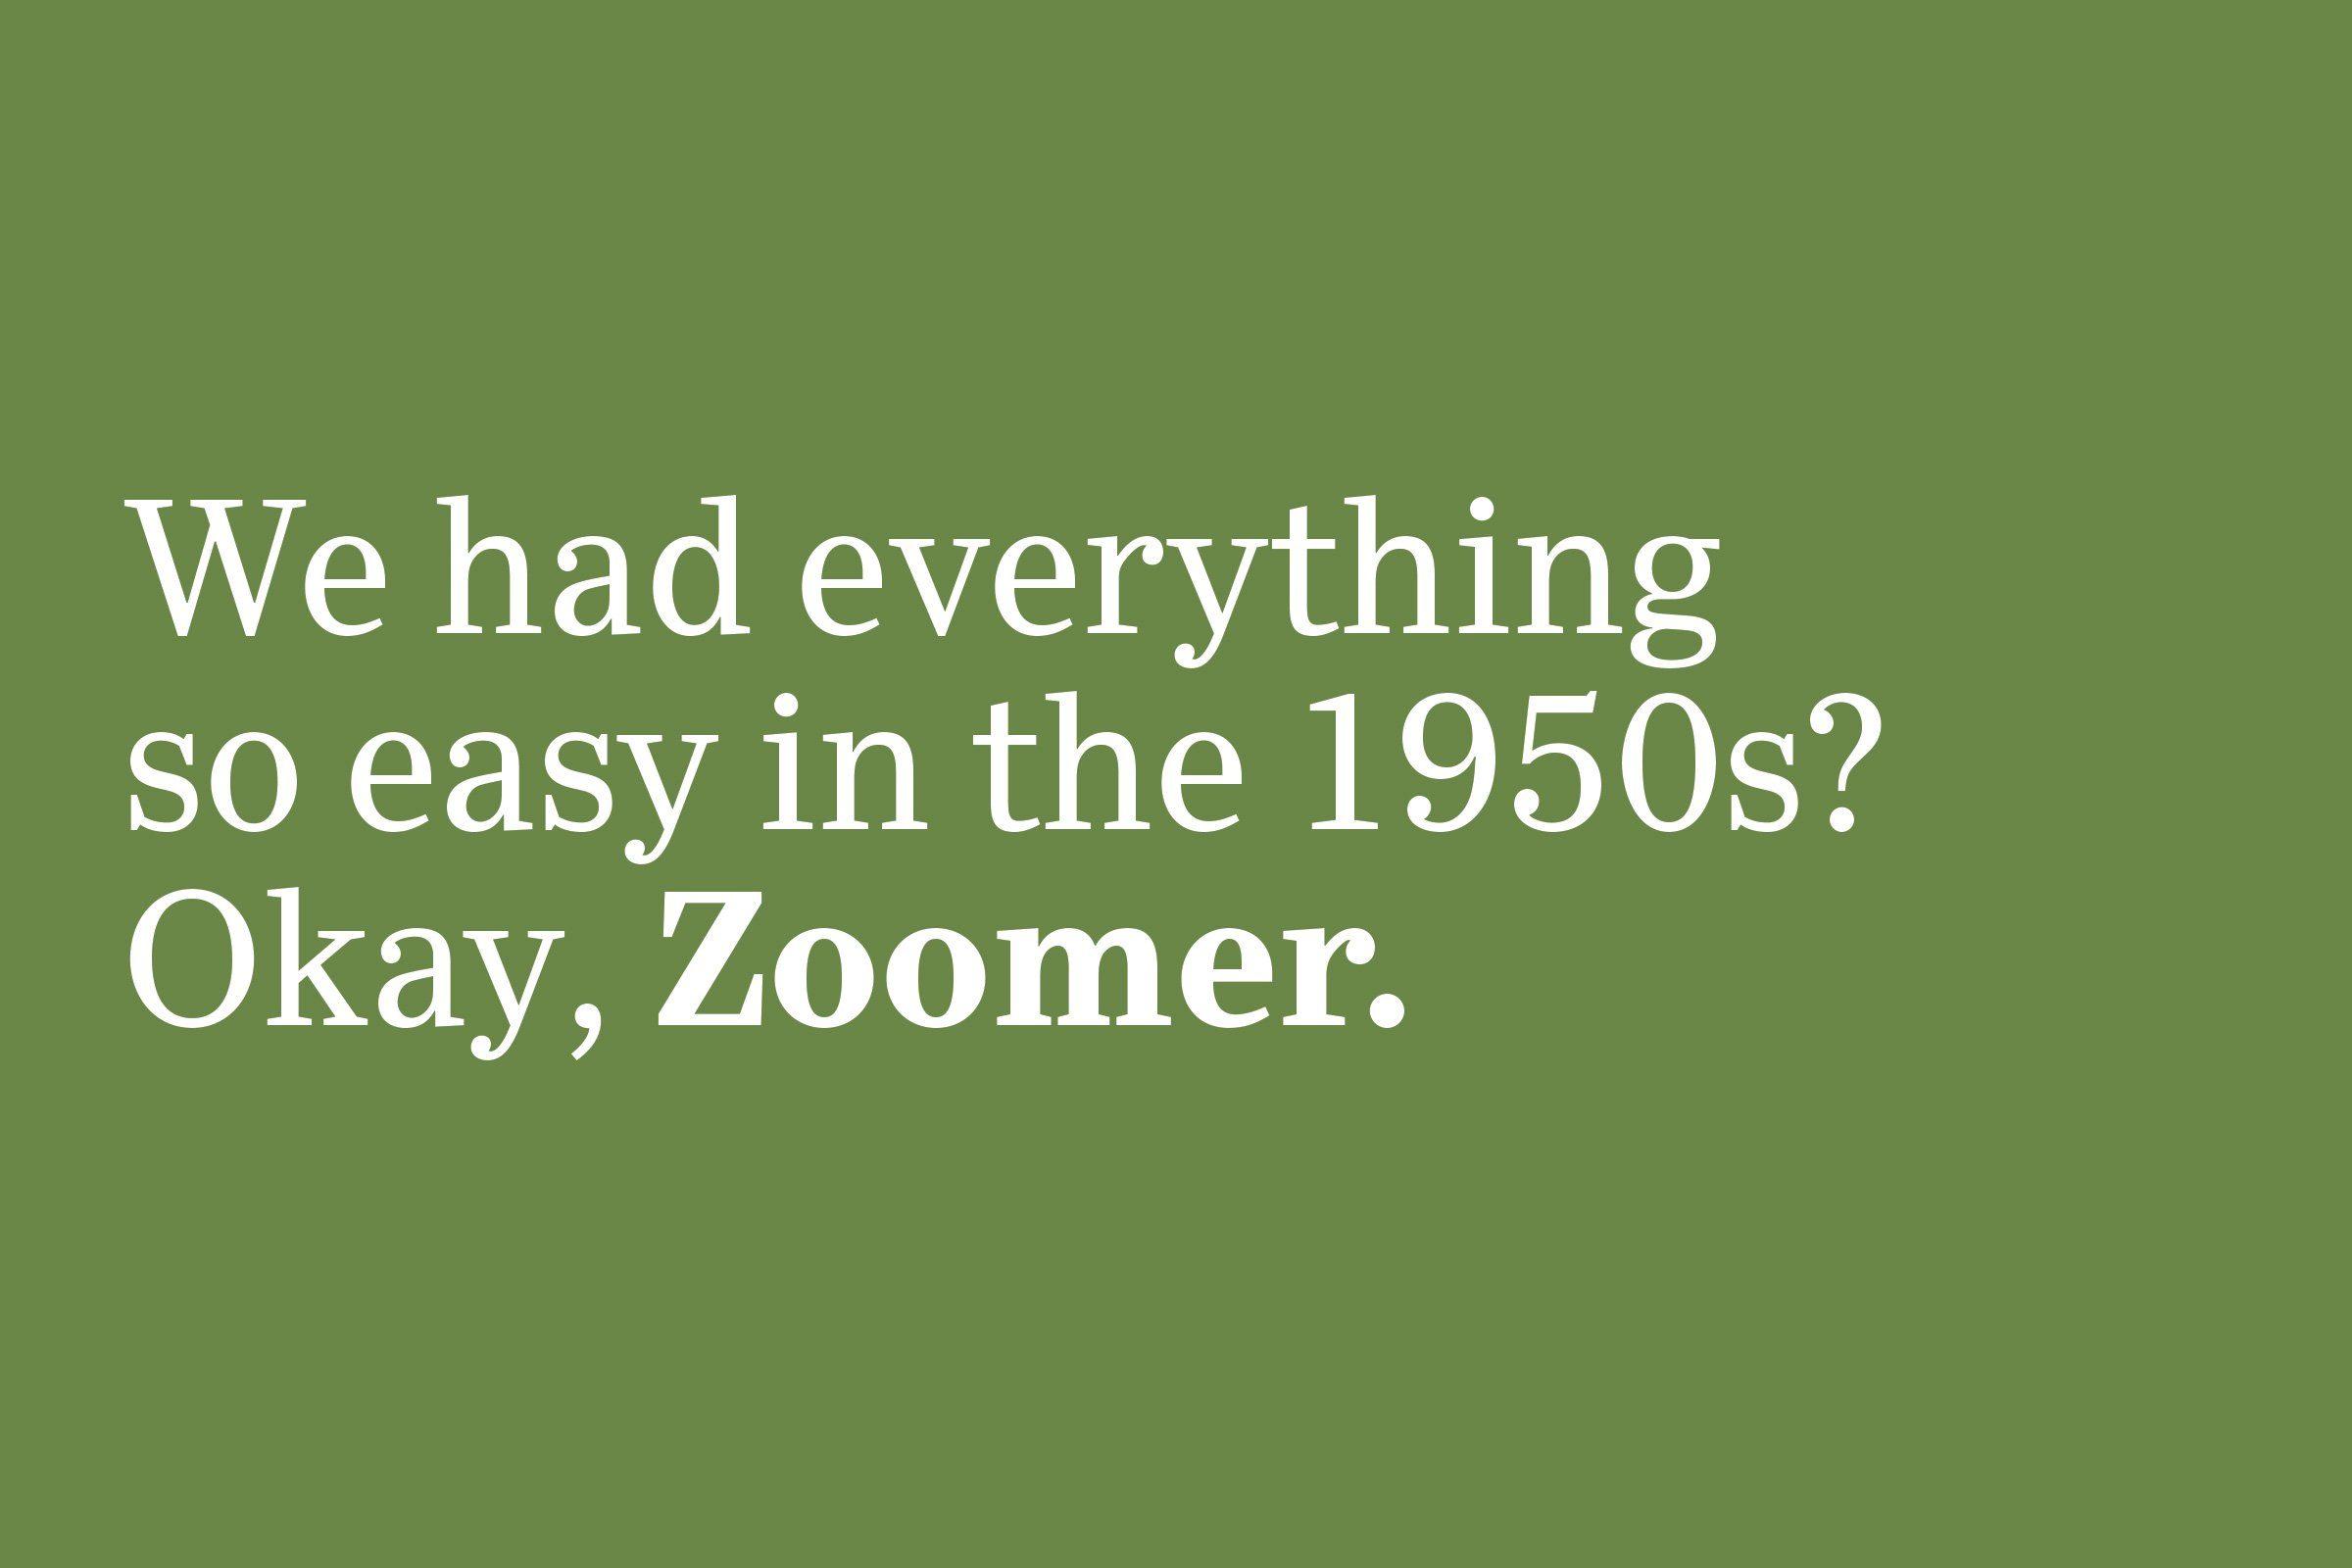 zoomer slang 2020